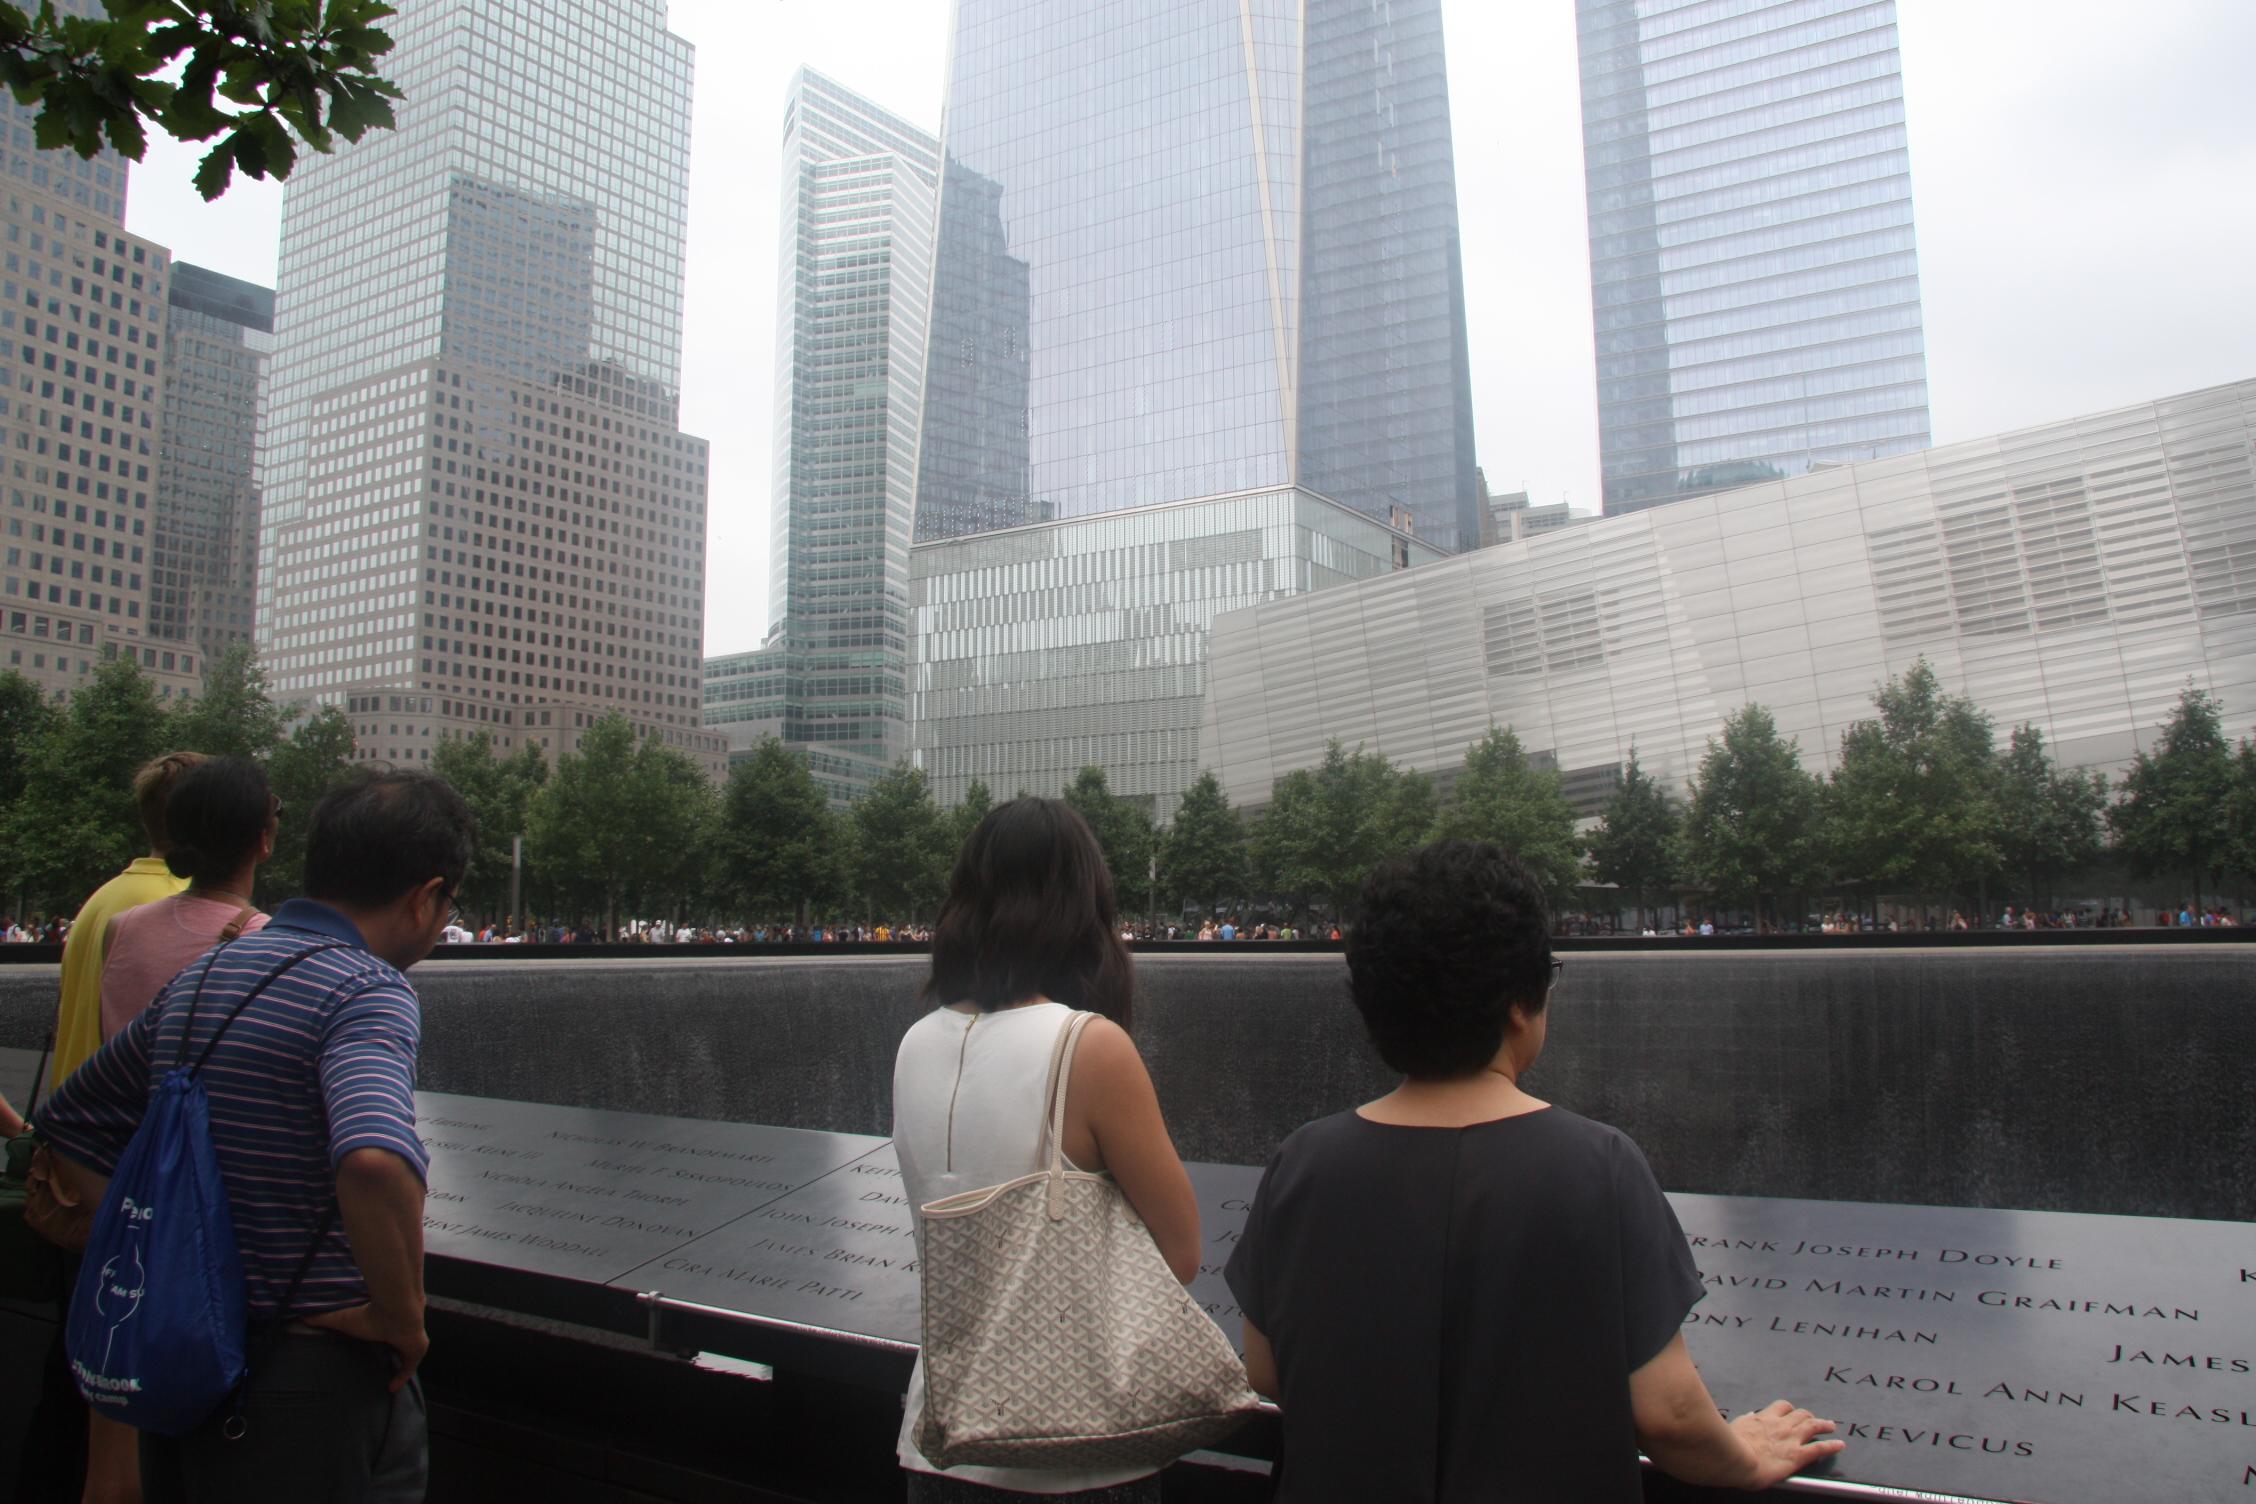 9/11 ground zero memorial